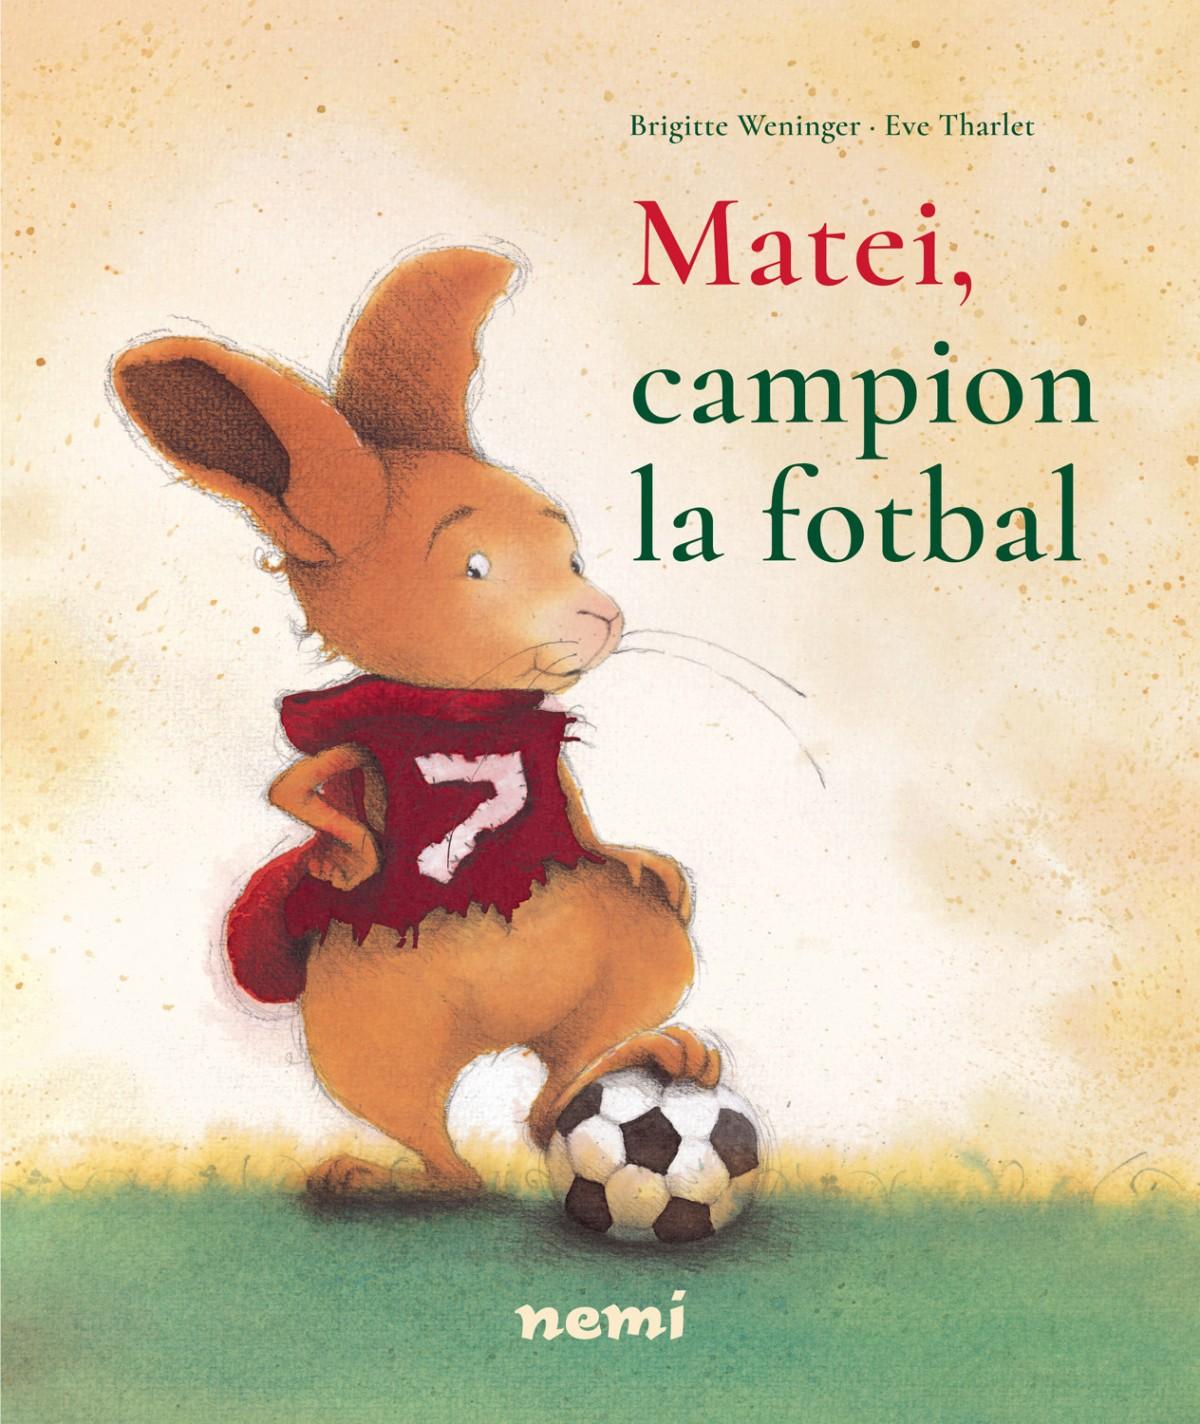 Matei, campion la fotbal